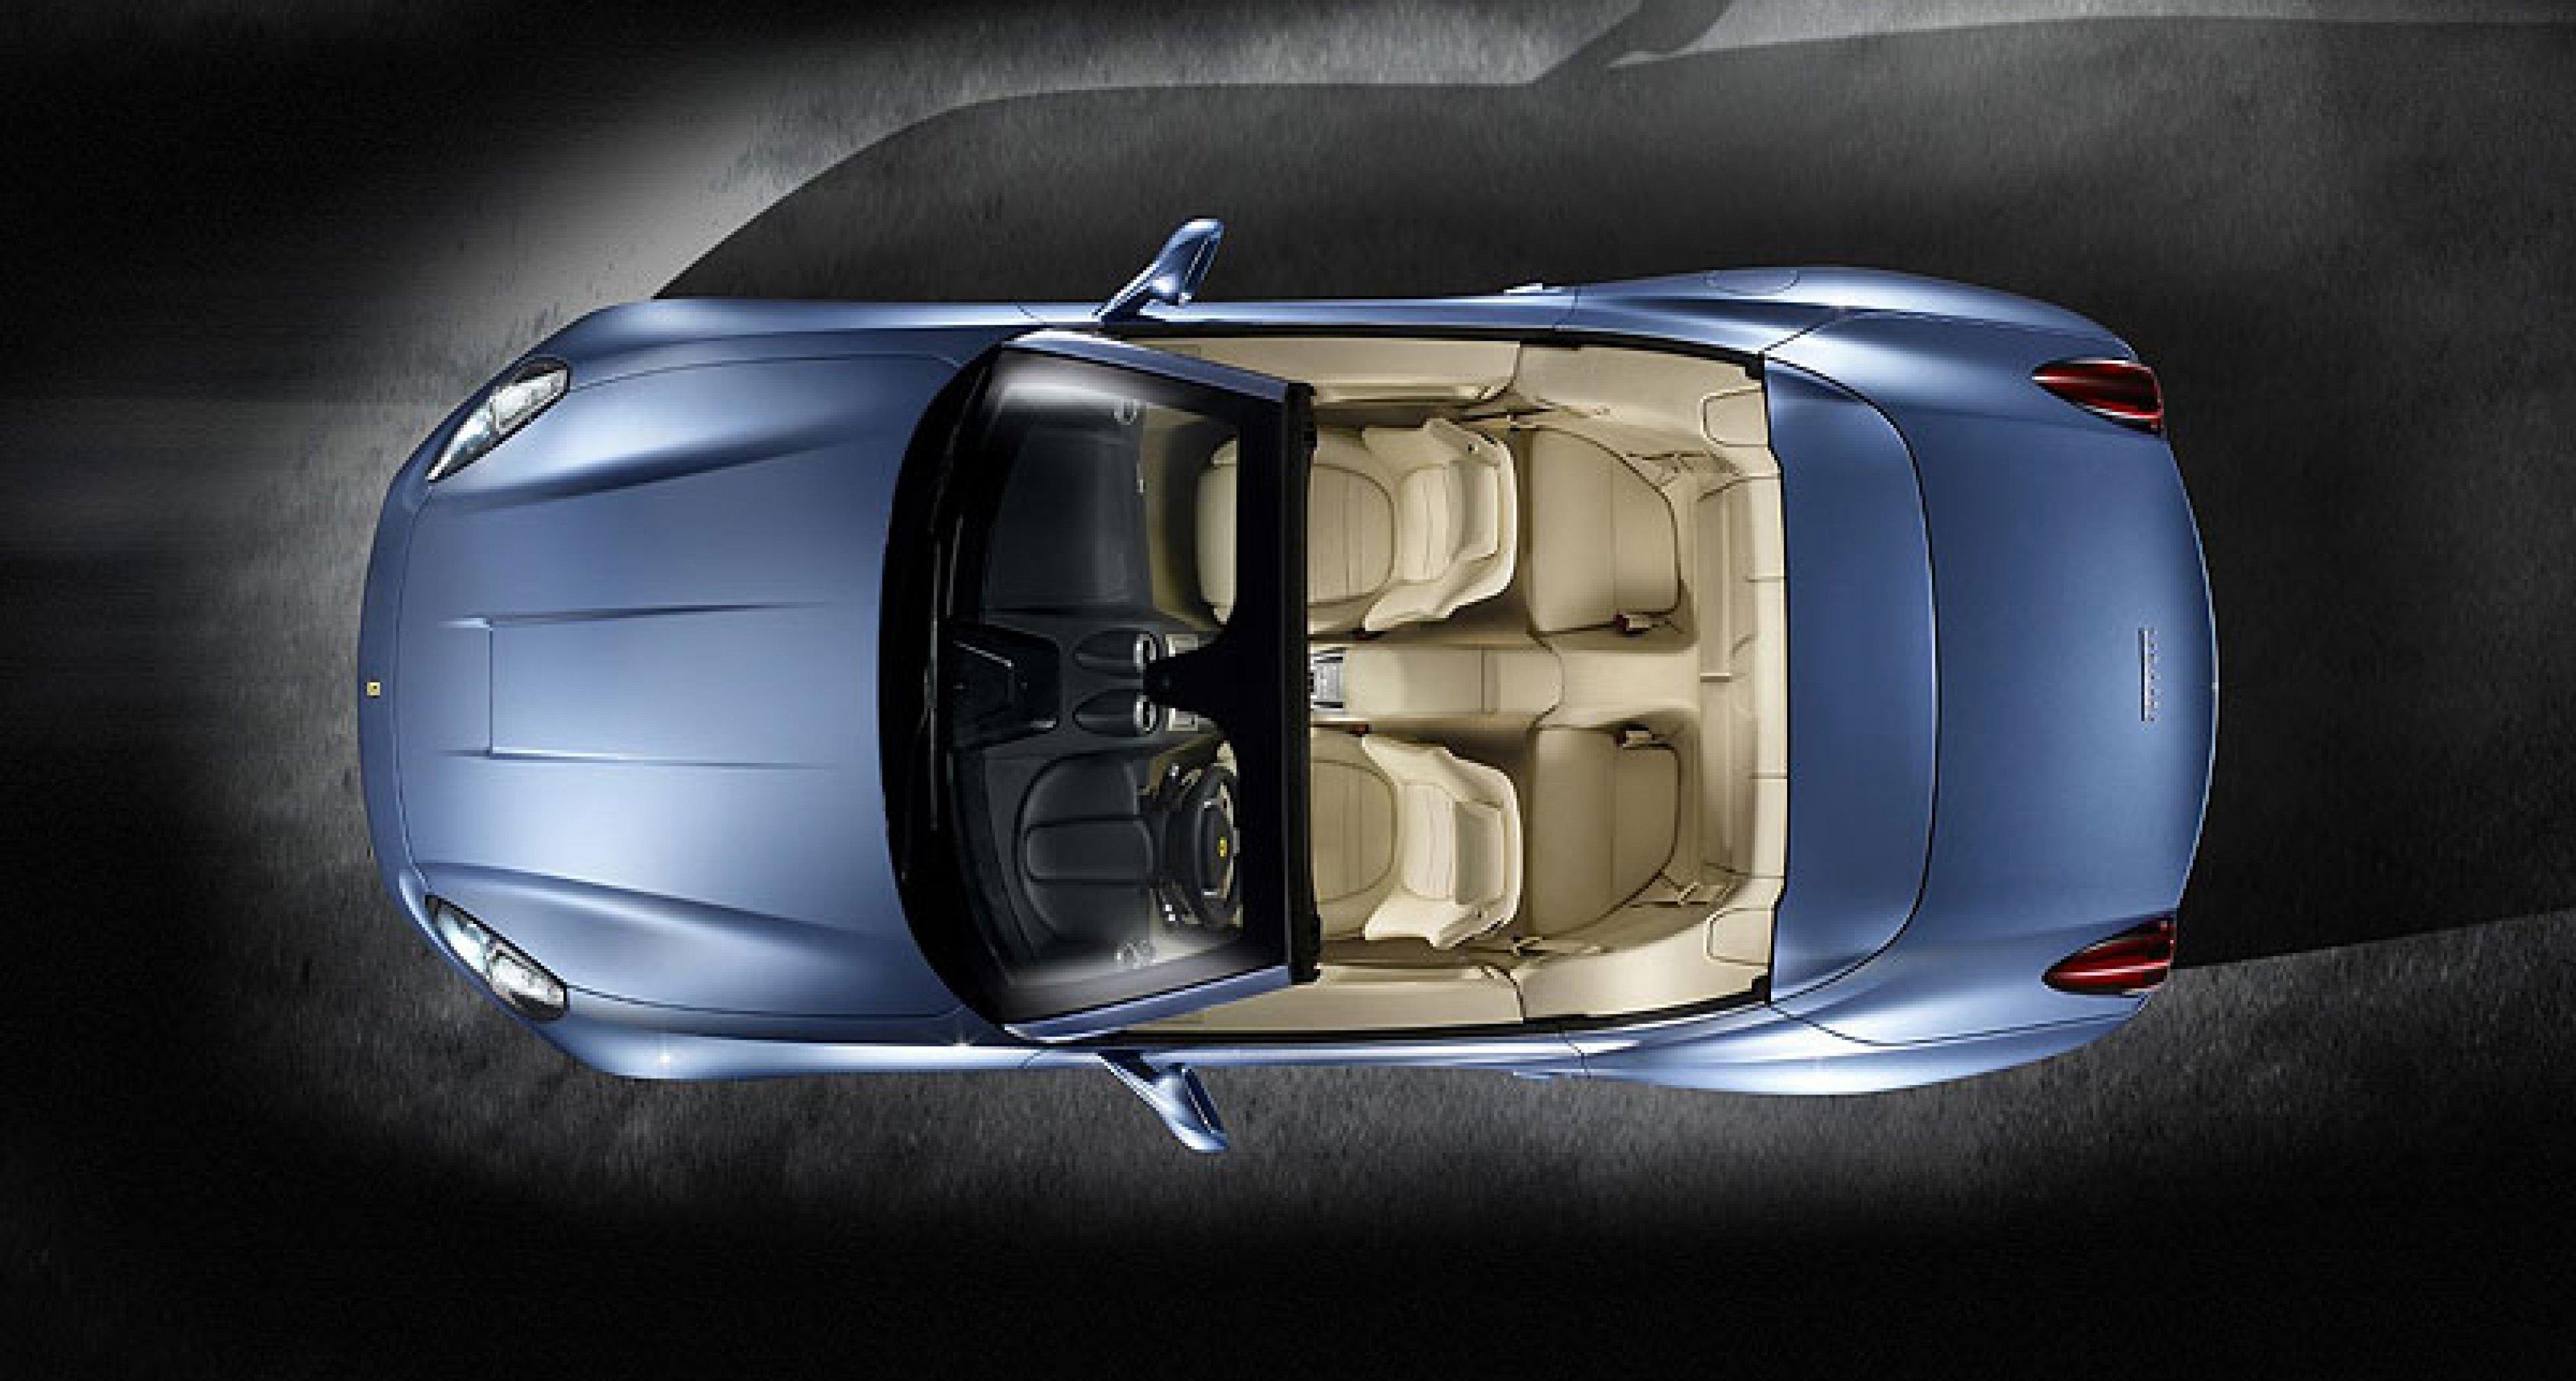 Ferrari California – New Photos and Facts